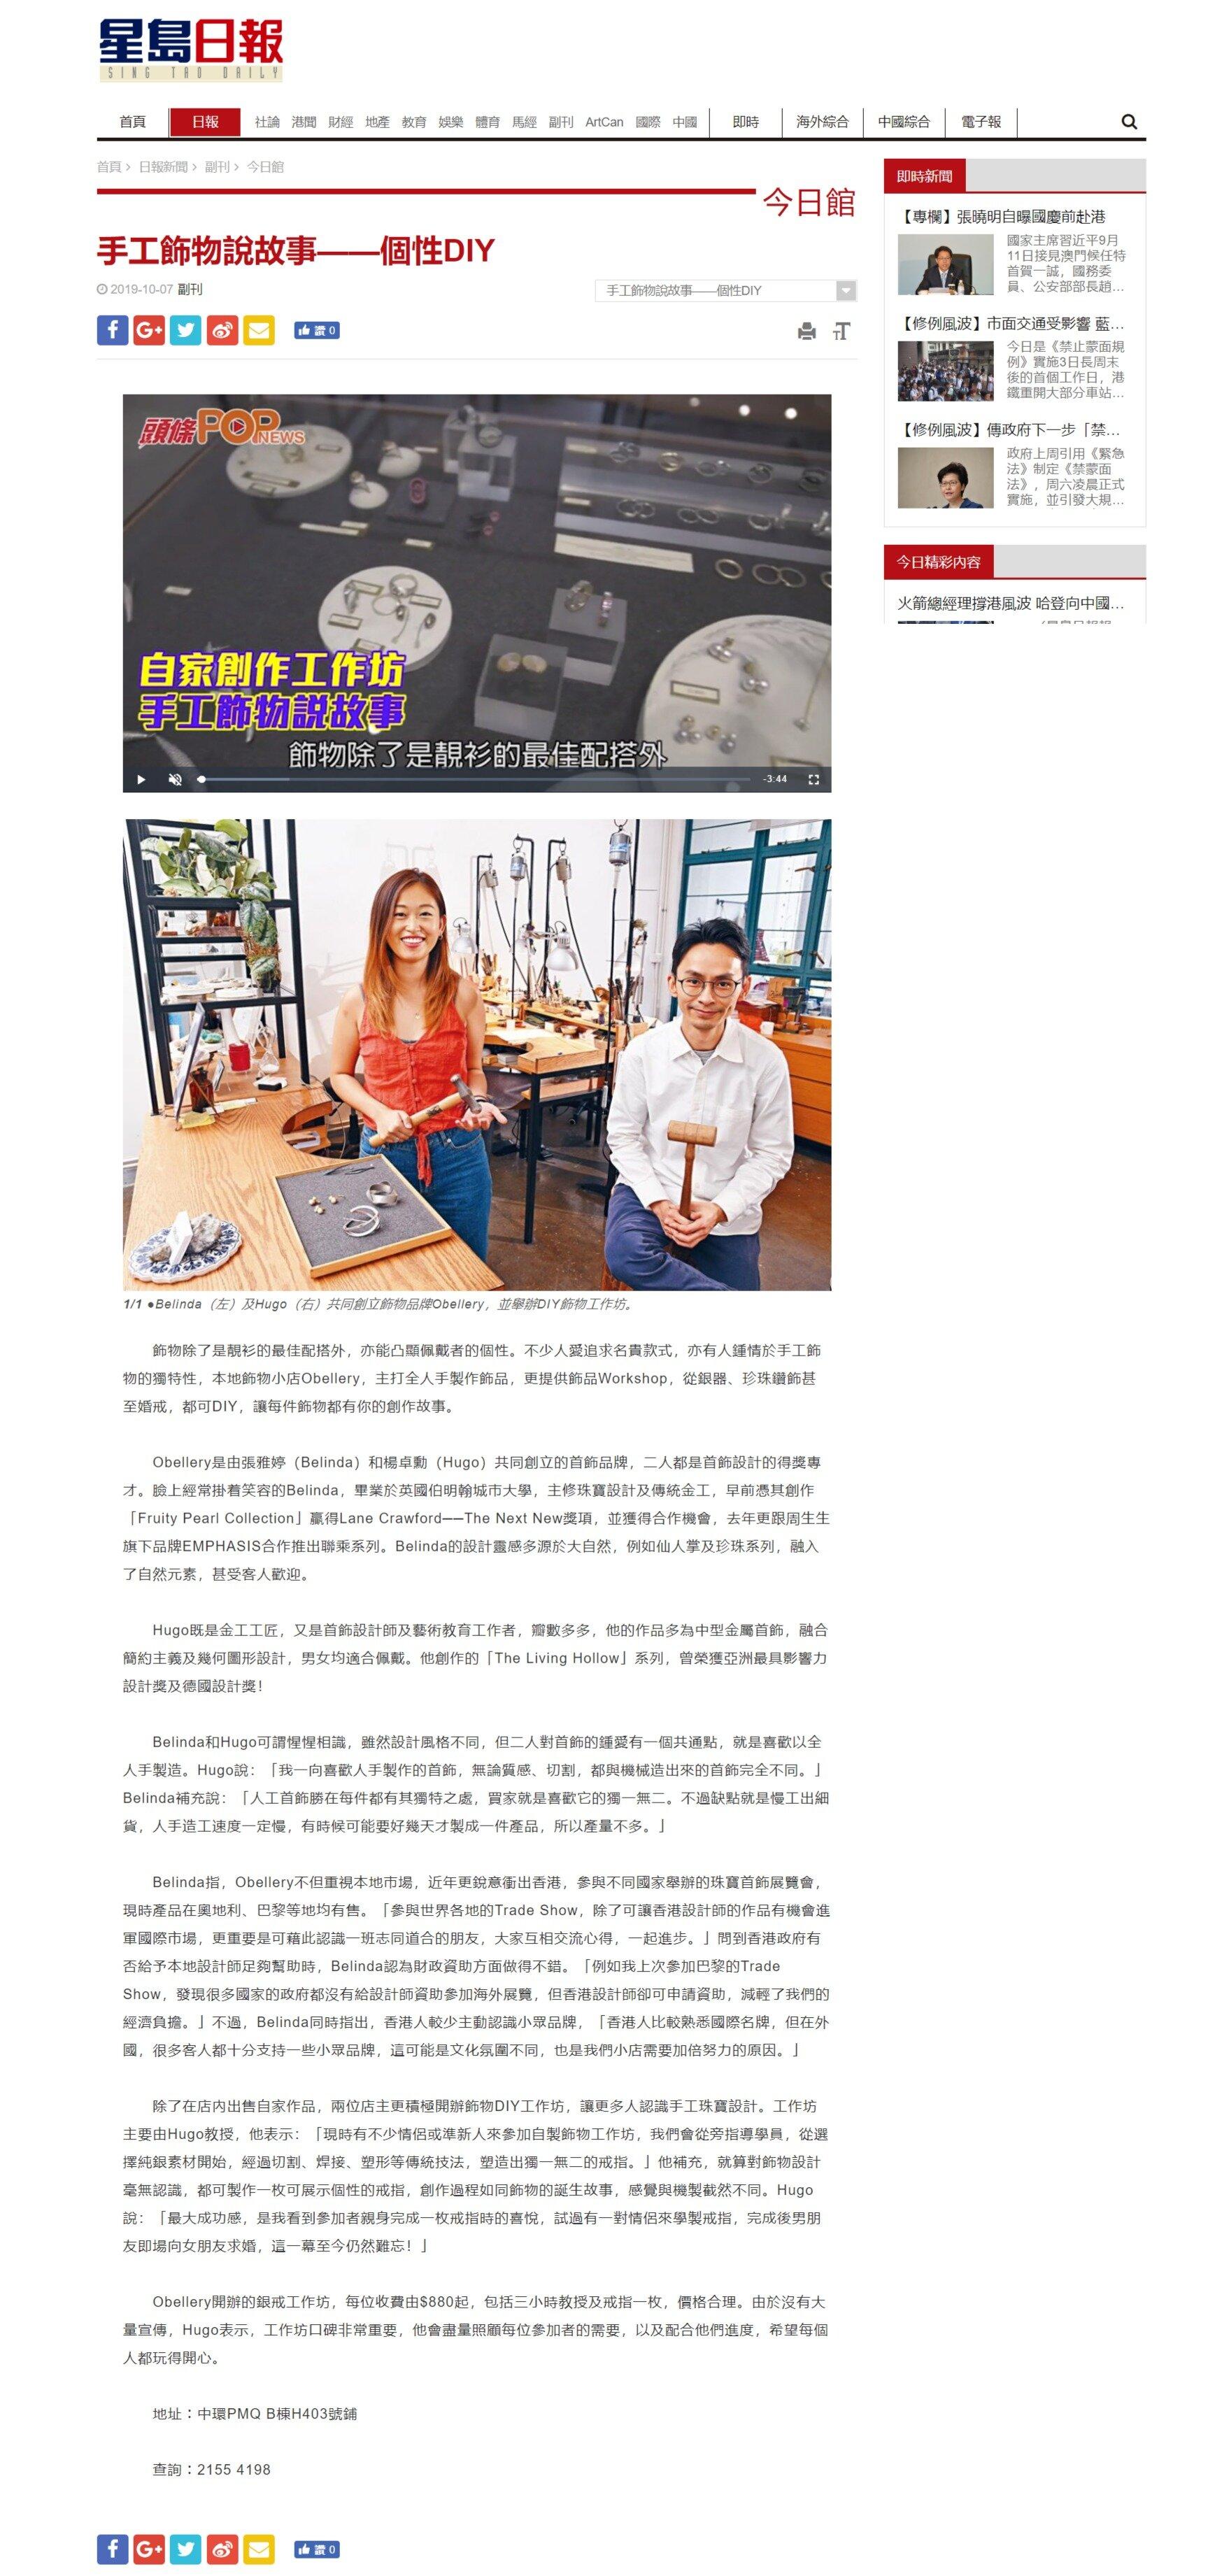 20191007_Sing Tao Daily News 2.jpg